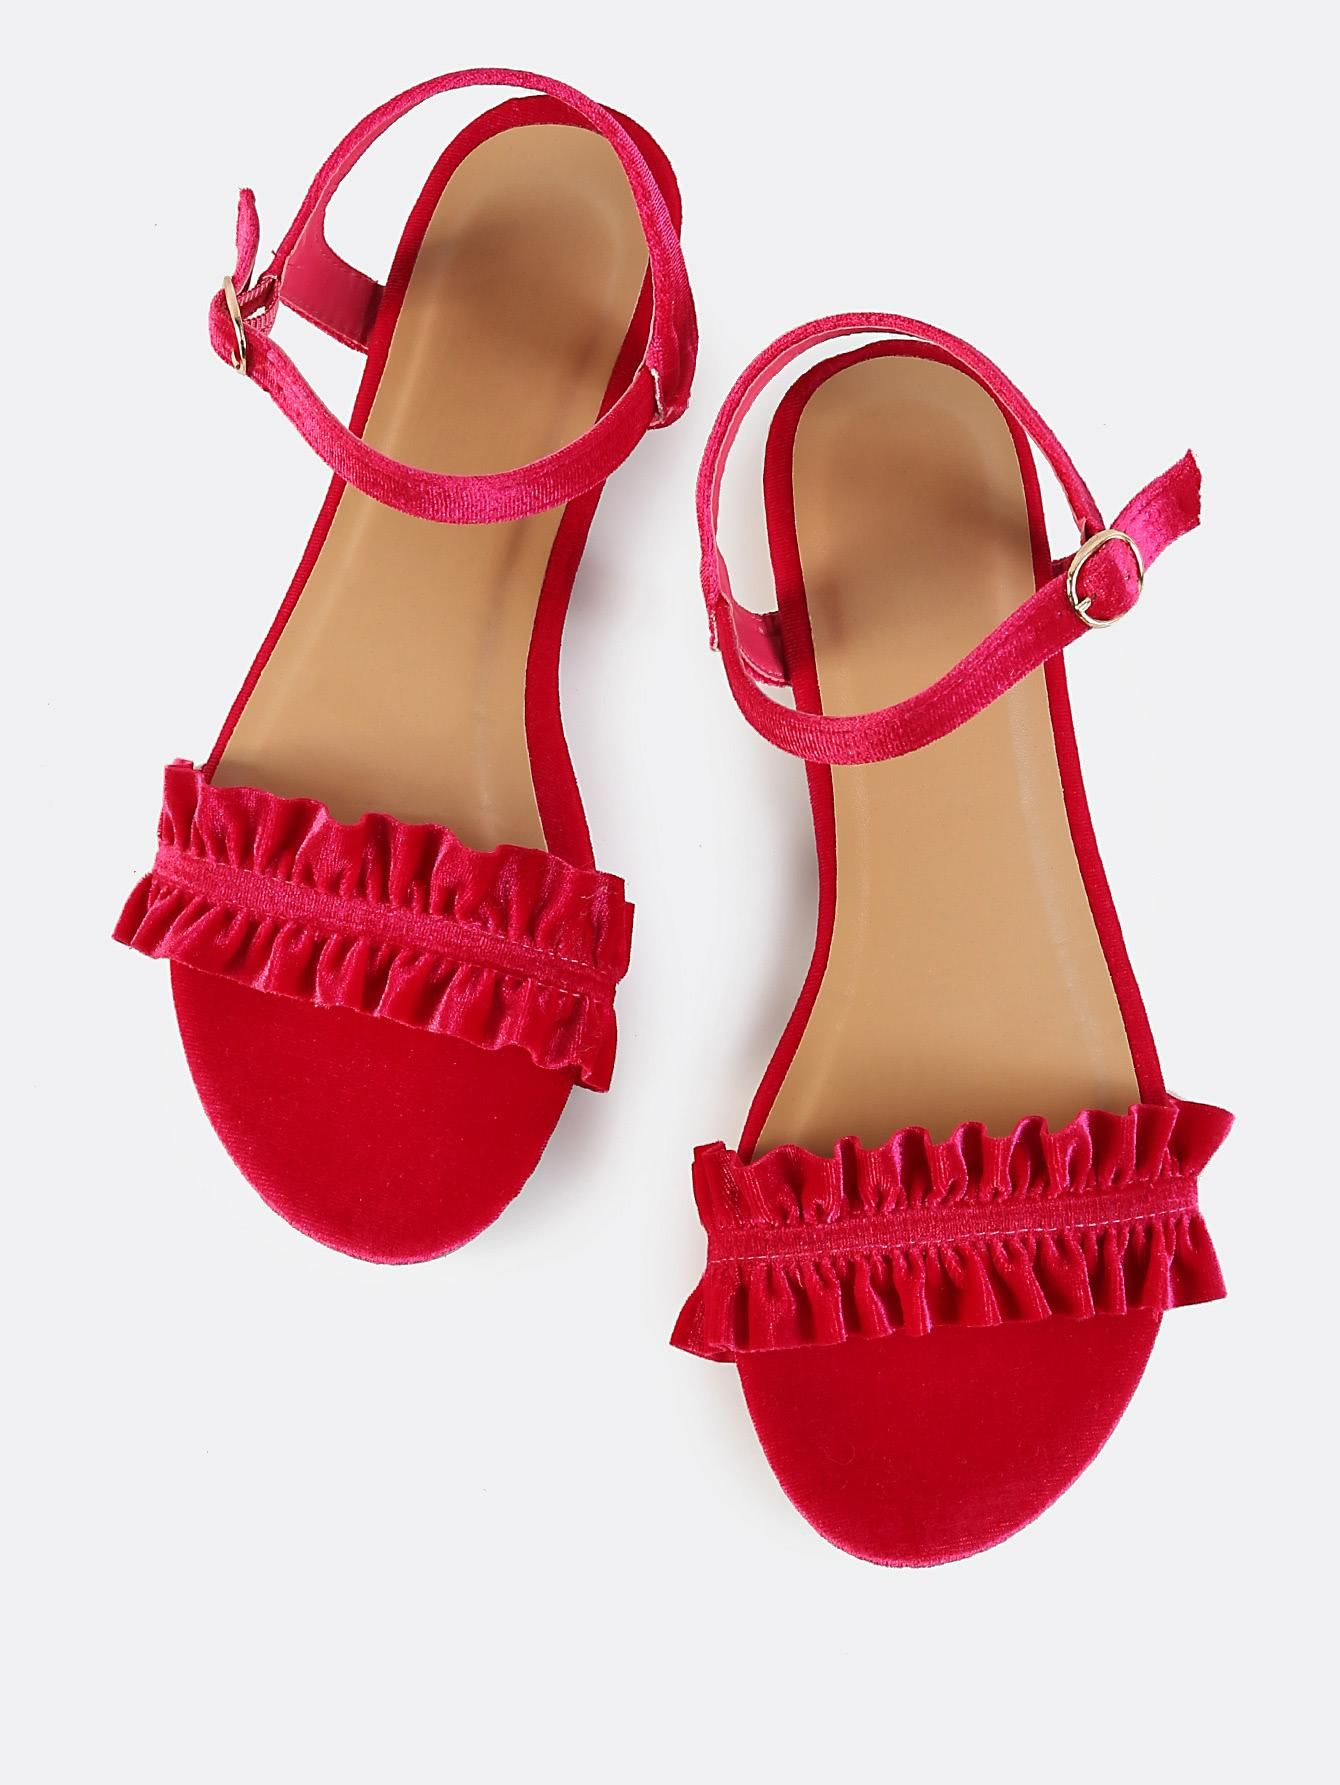 Hot pink dress shoes  Ankle Strap Velvet Ruffle Sandals HOT PINK  Summer  Pinterest